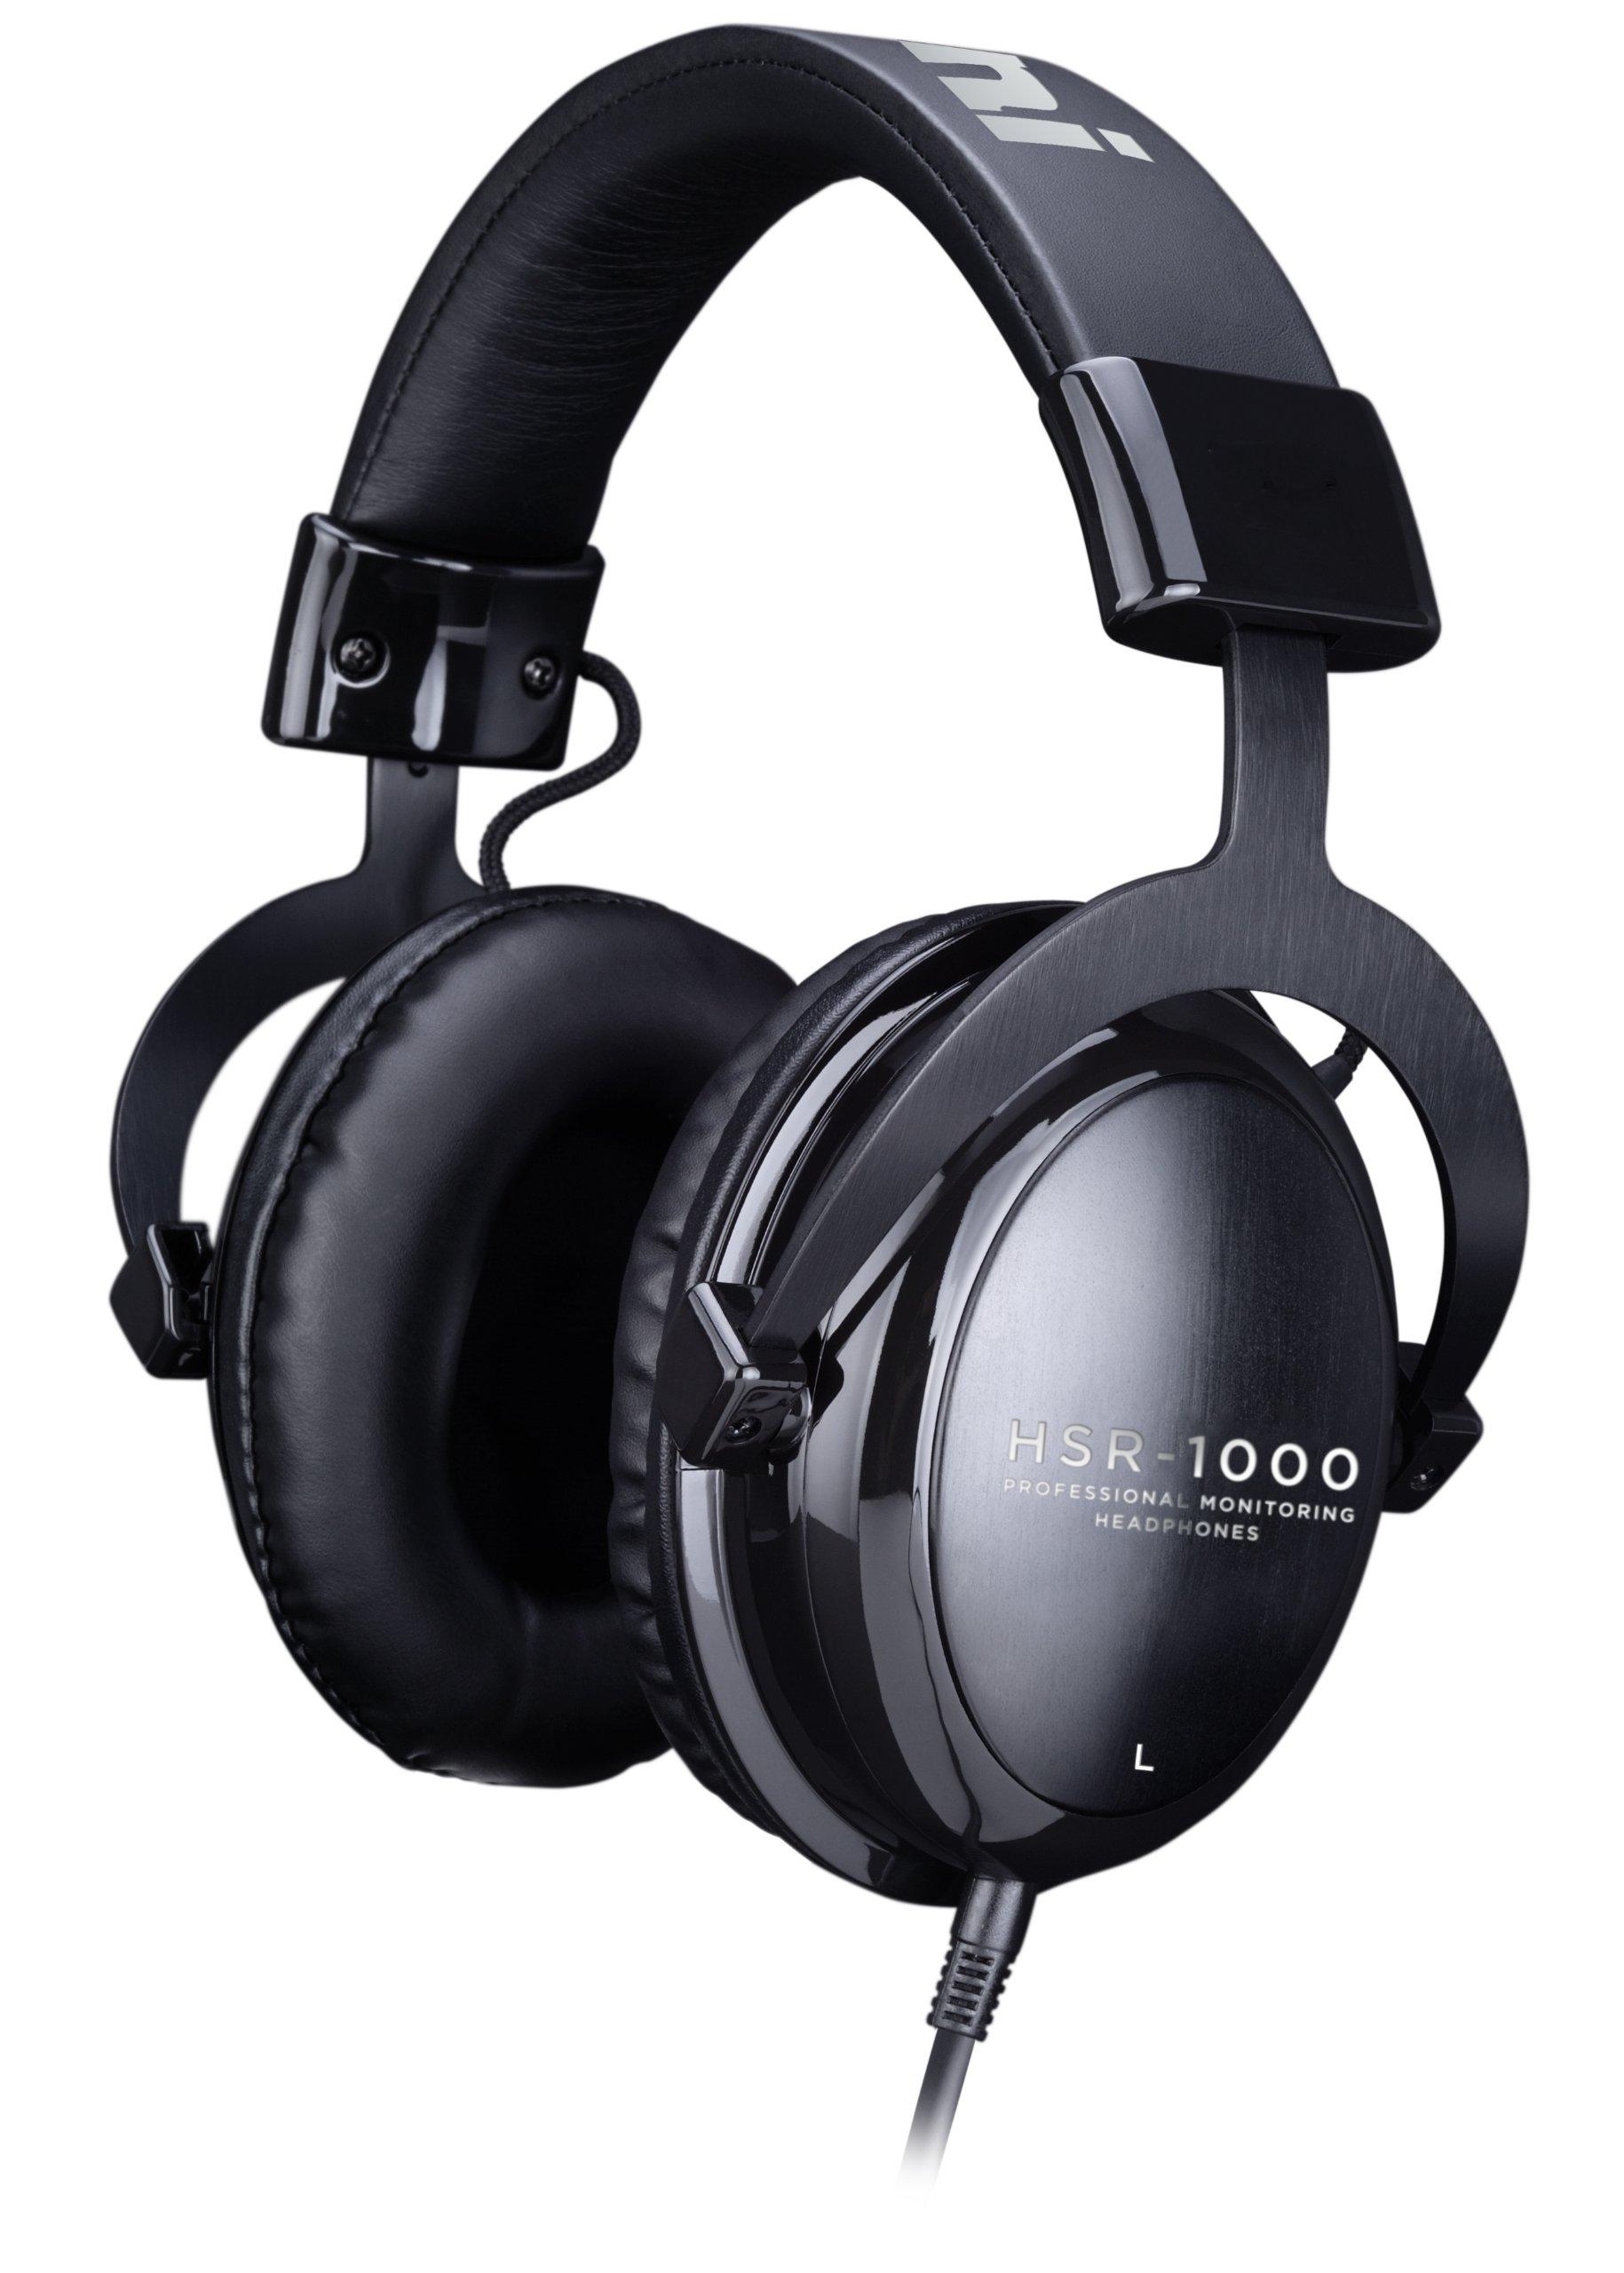 Gemini DJ HSR-1000 - Professional Monitoring Headphones